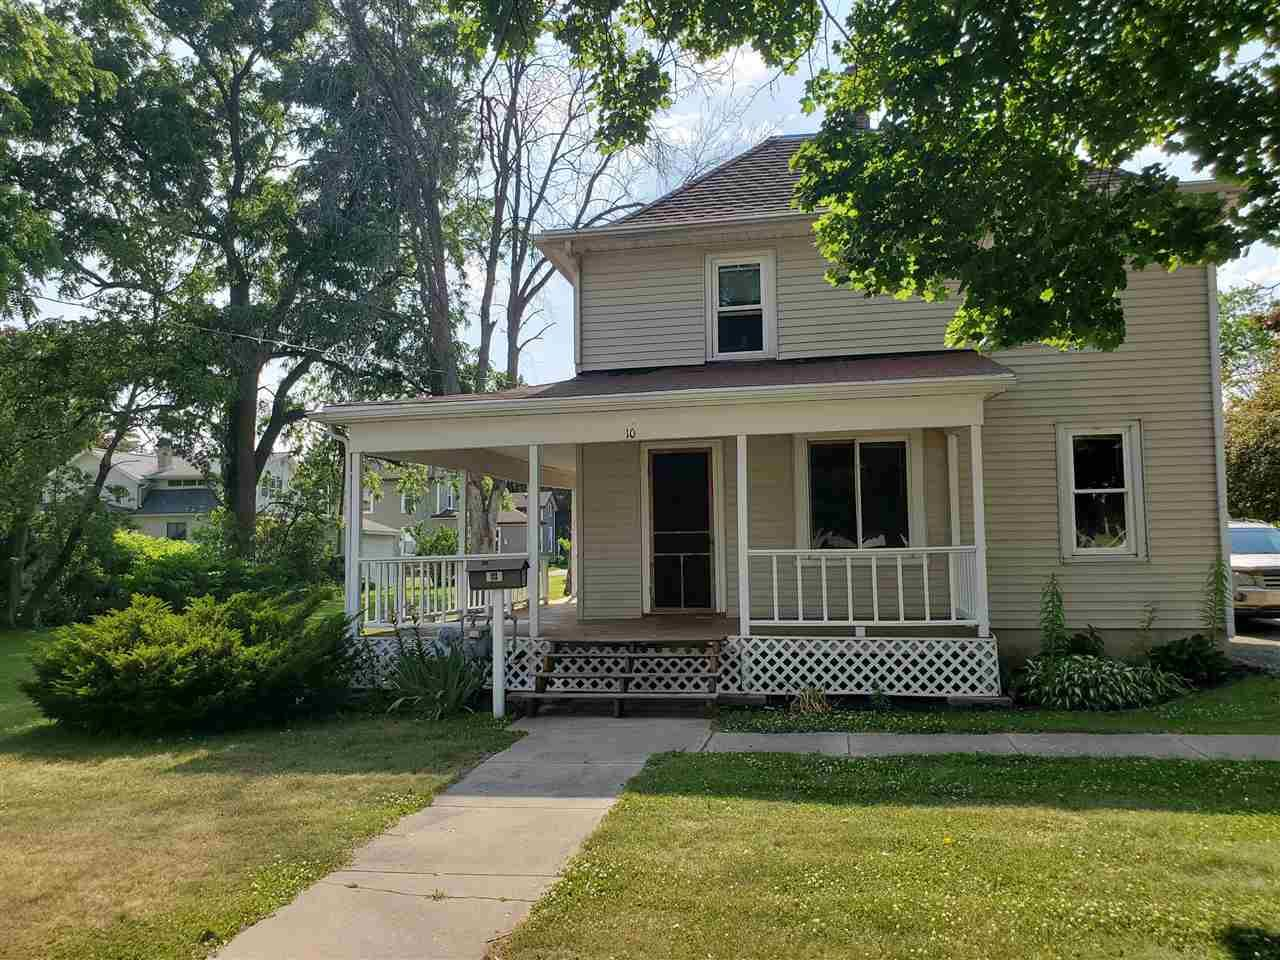 f_1911593 Real Estate in 53534 zip code